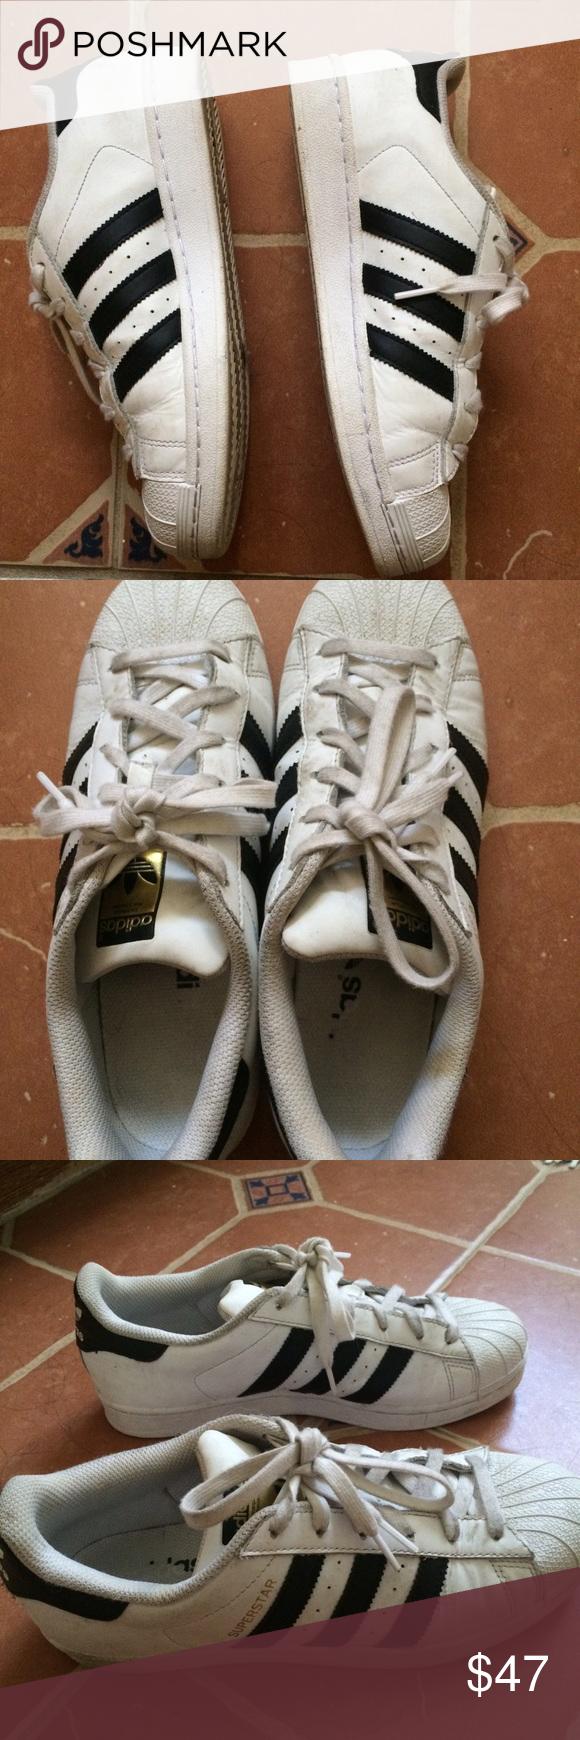 Adidas superstar usato guarda shoeswholesale